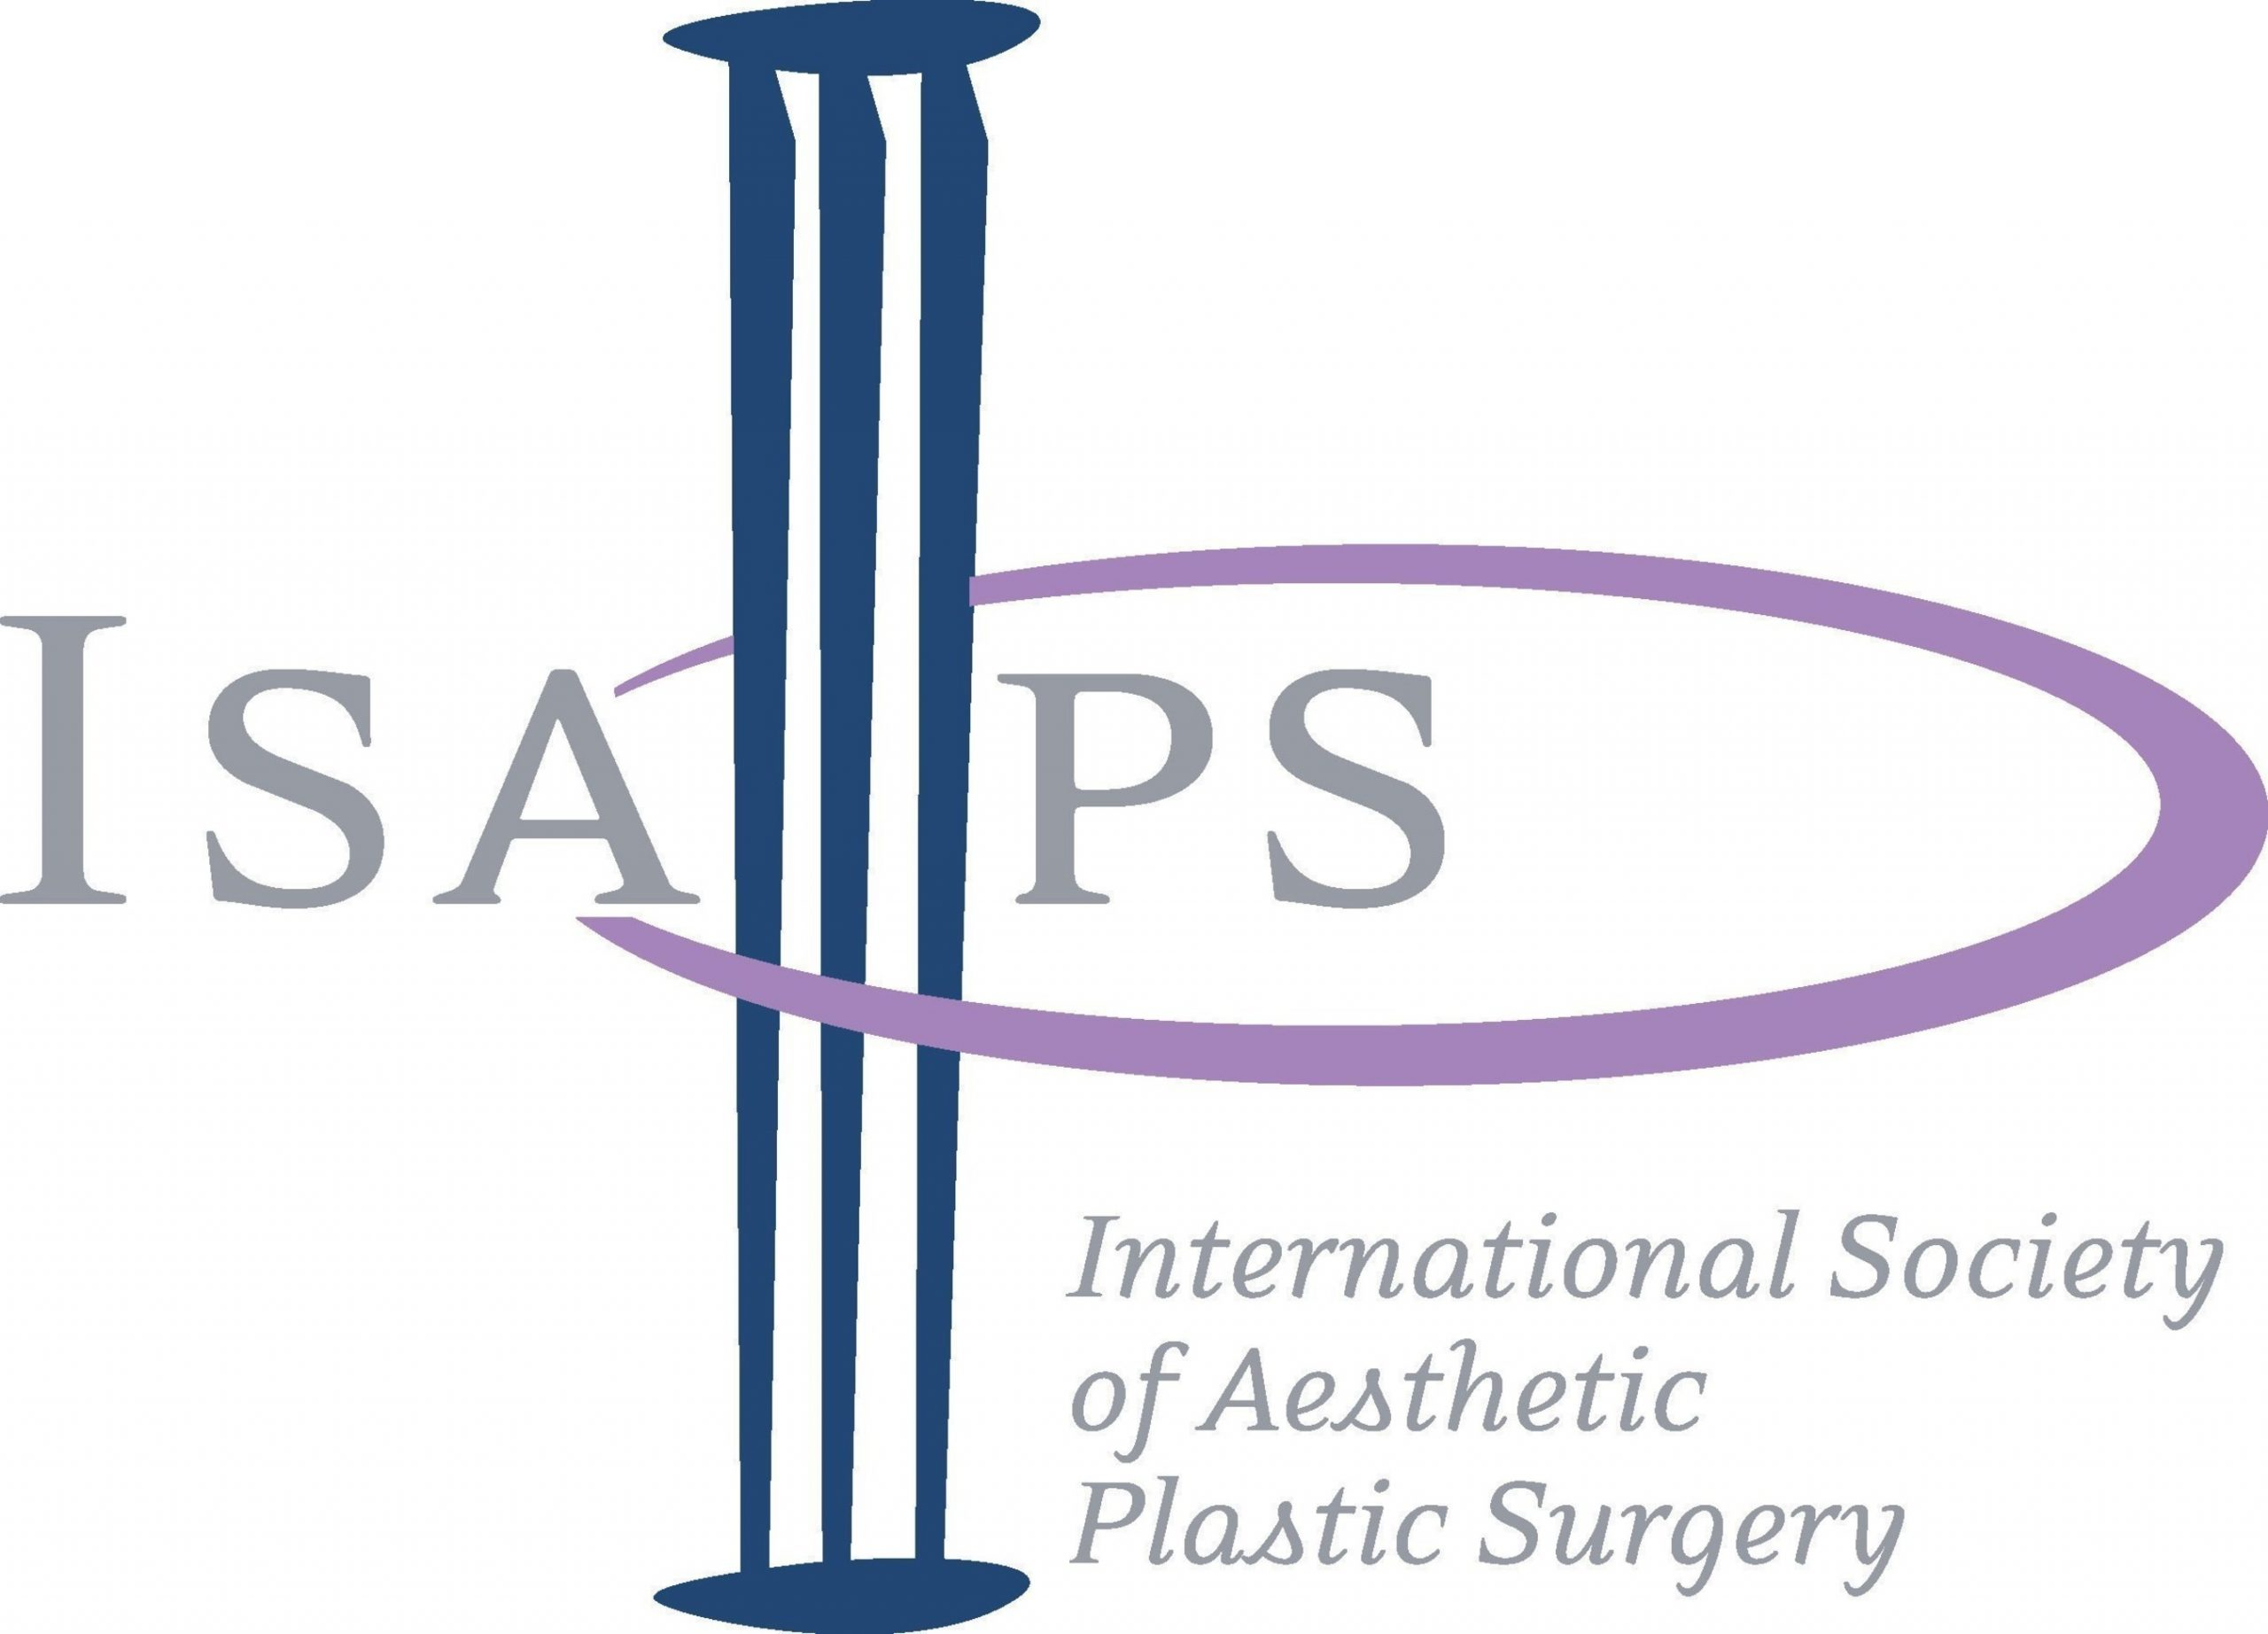 International Society of Aesthetic Plastic Surgery (ISAPS) (PRNewsFoto/International Society of Aesthet)